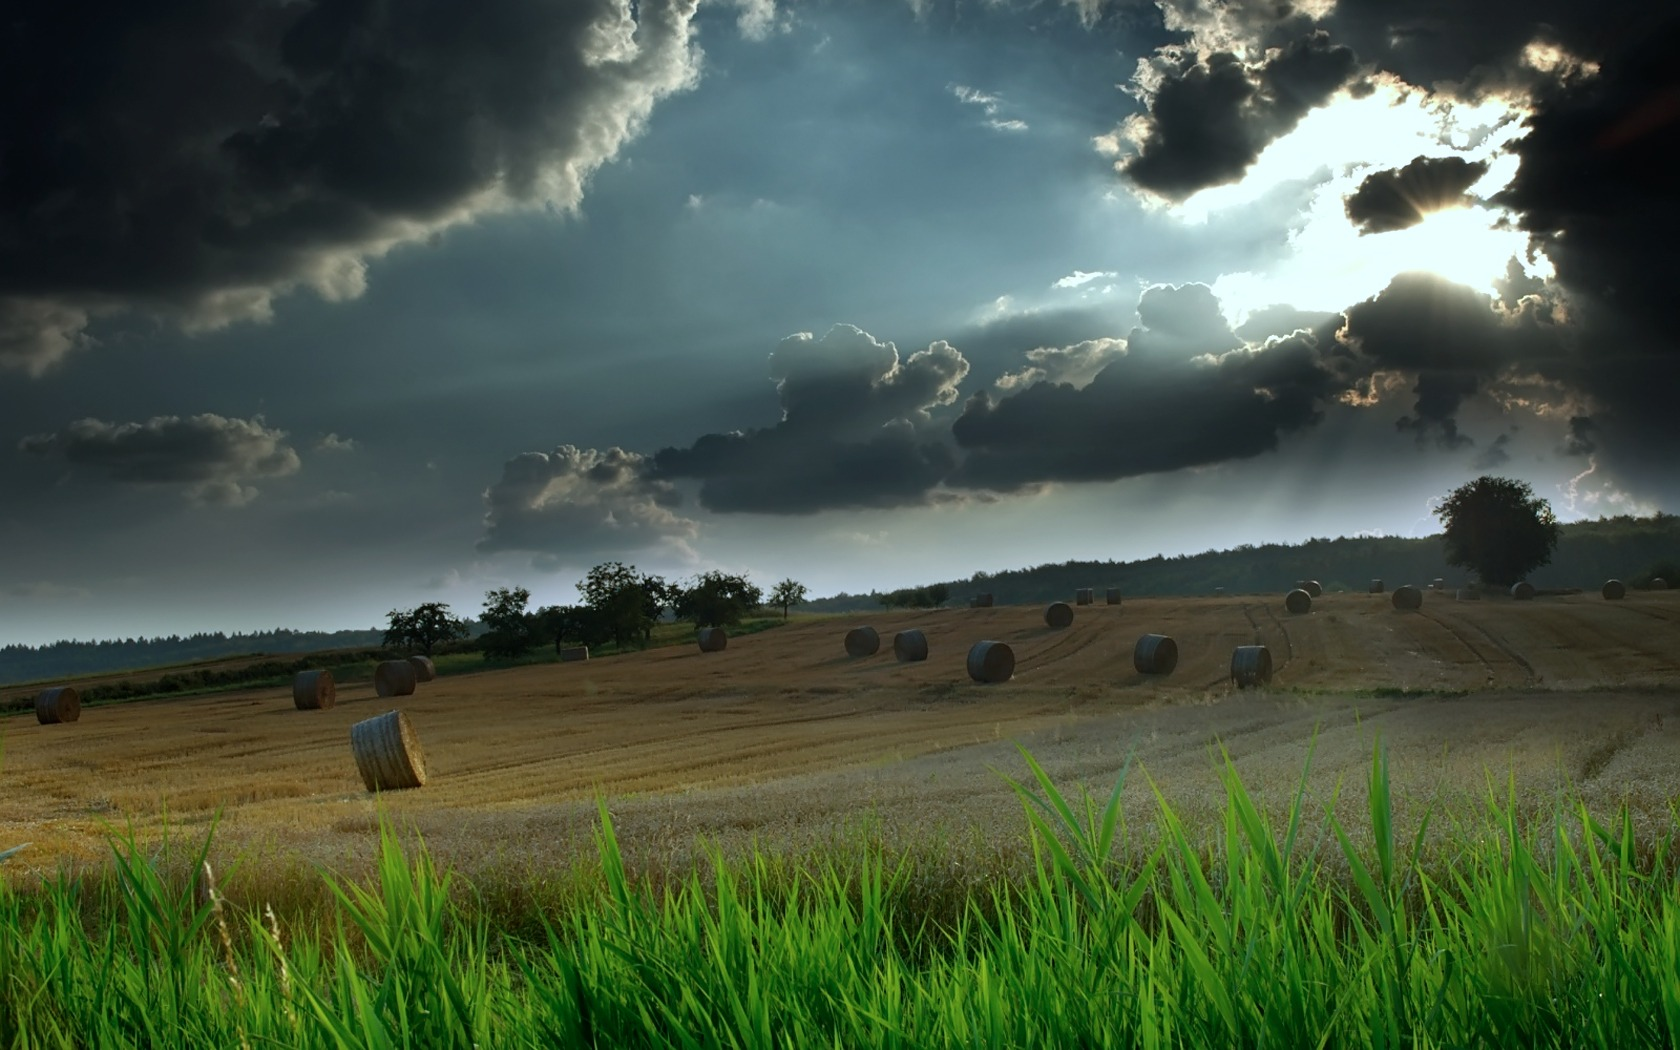 hayfield wallpaper landscape nature wallpapers in jpg format for